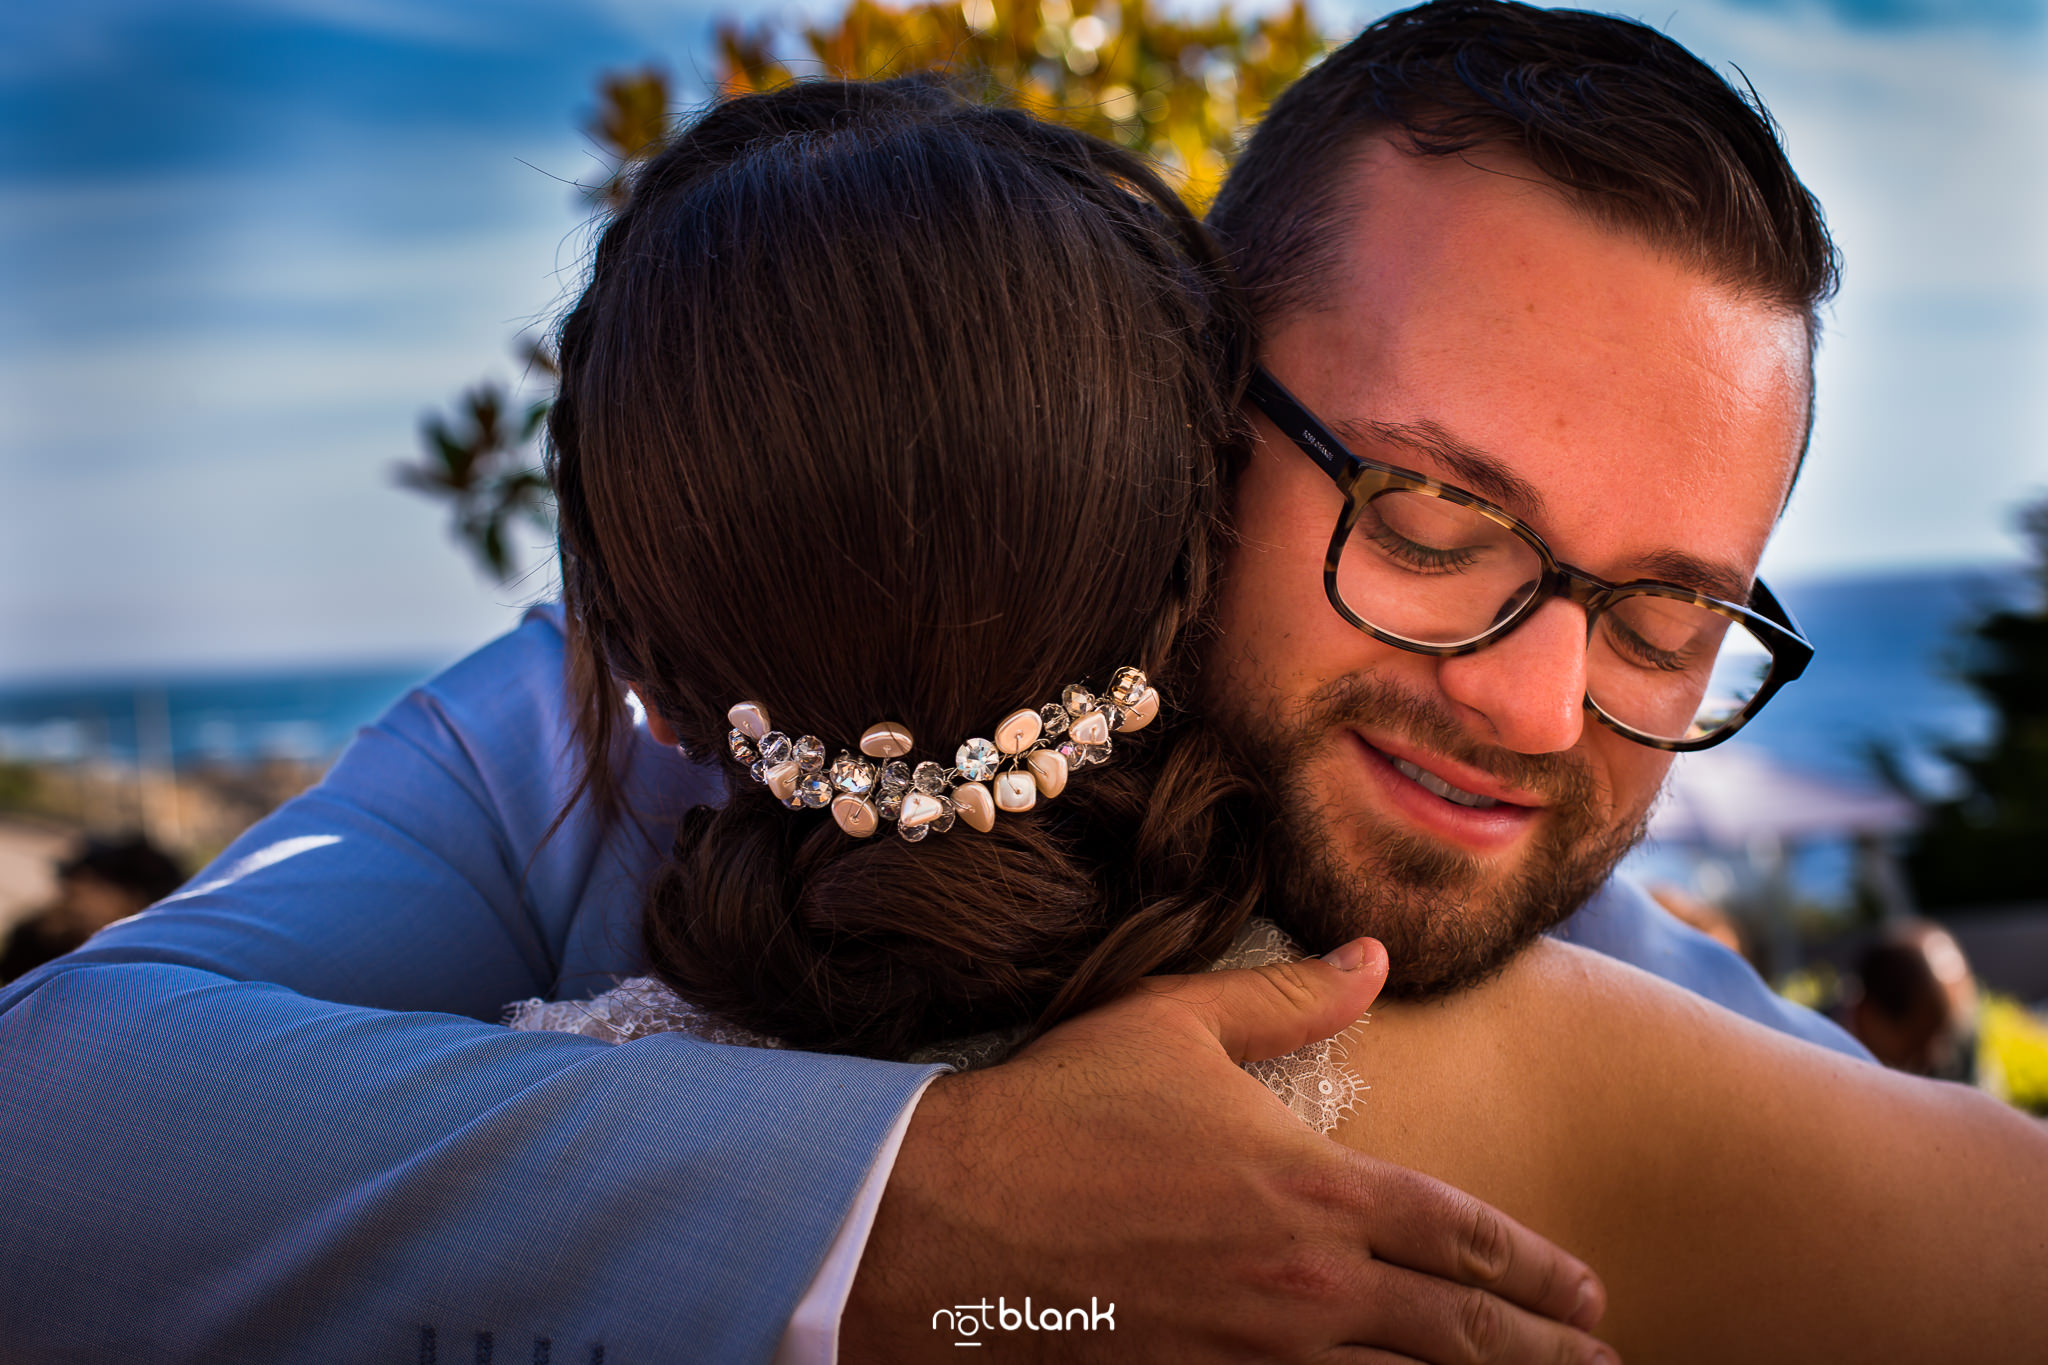 Boda-de-destino-Maite-David-Amigos-Felicitan-Novia-Ceremonia-Civil-Talaso-Atlantico. Reportaje realizado por Notblank Fotografos de boda